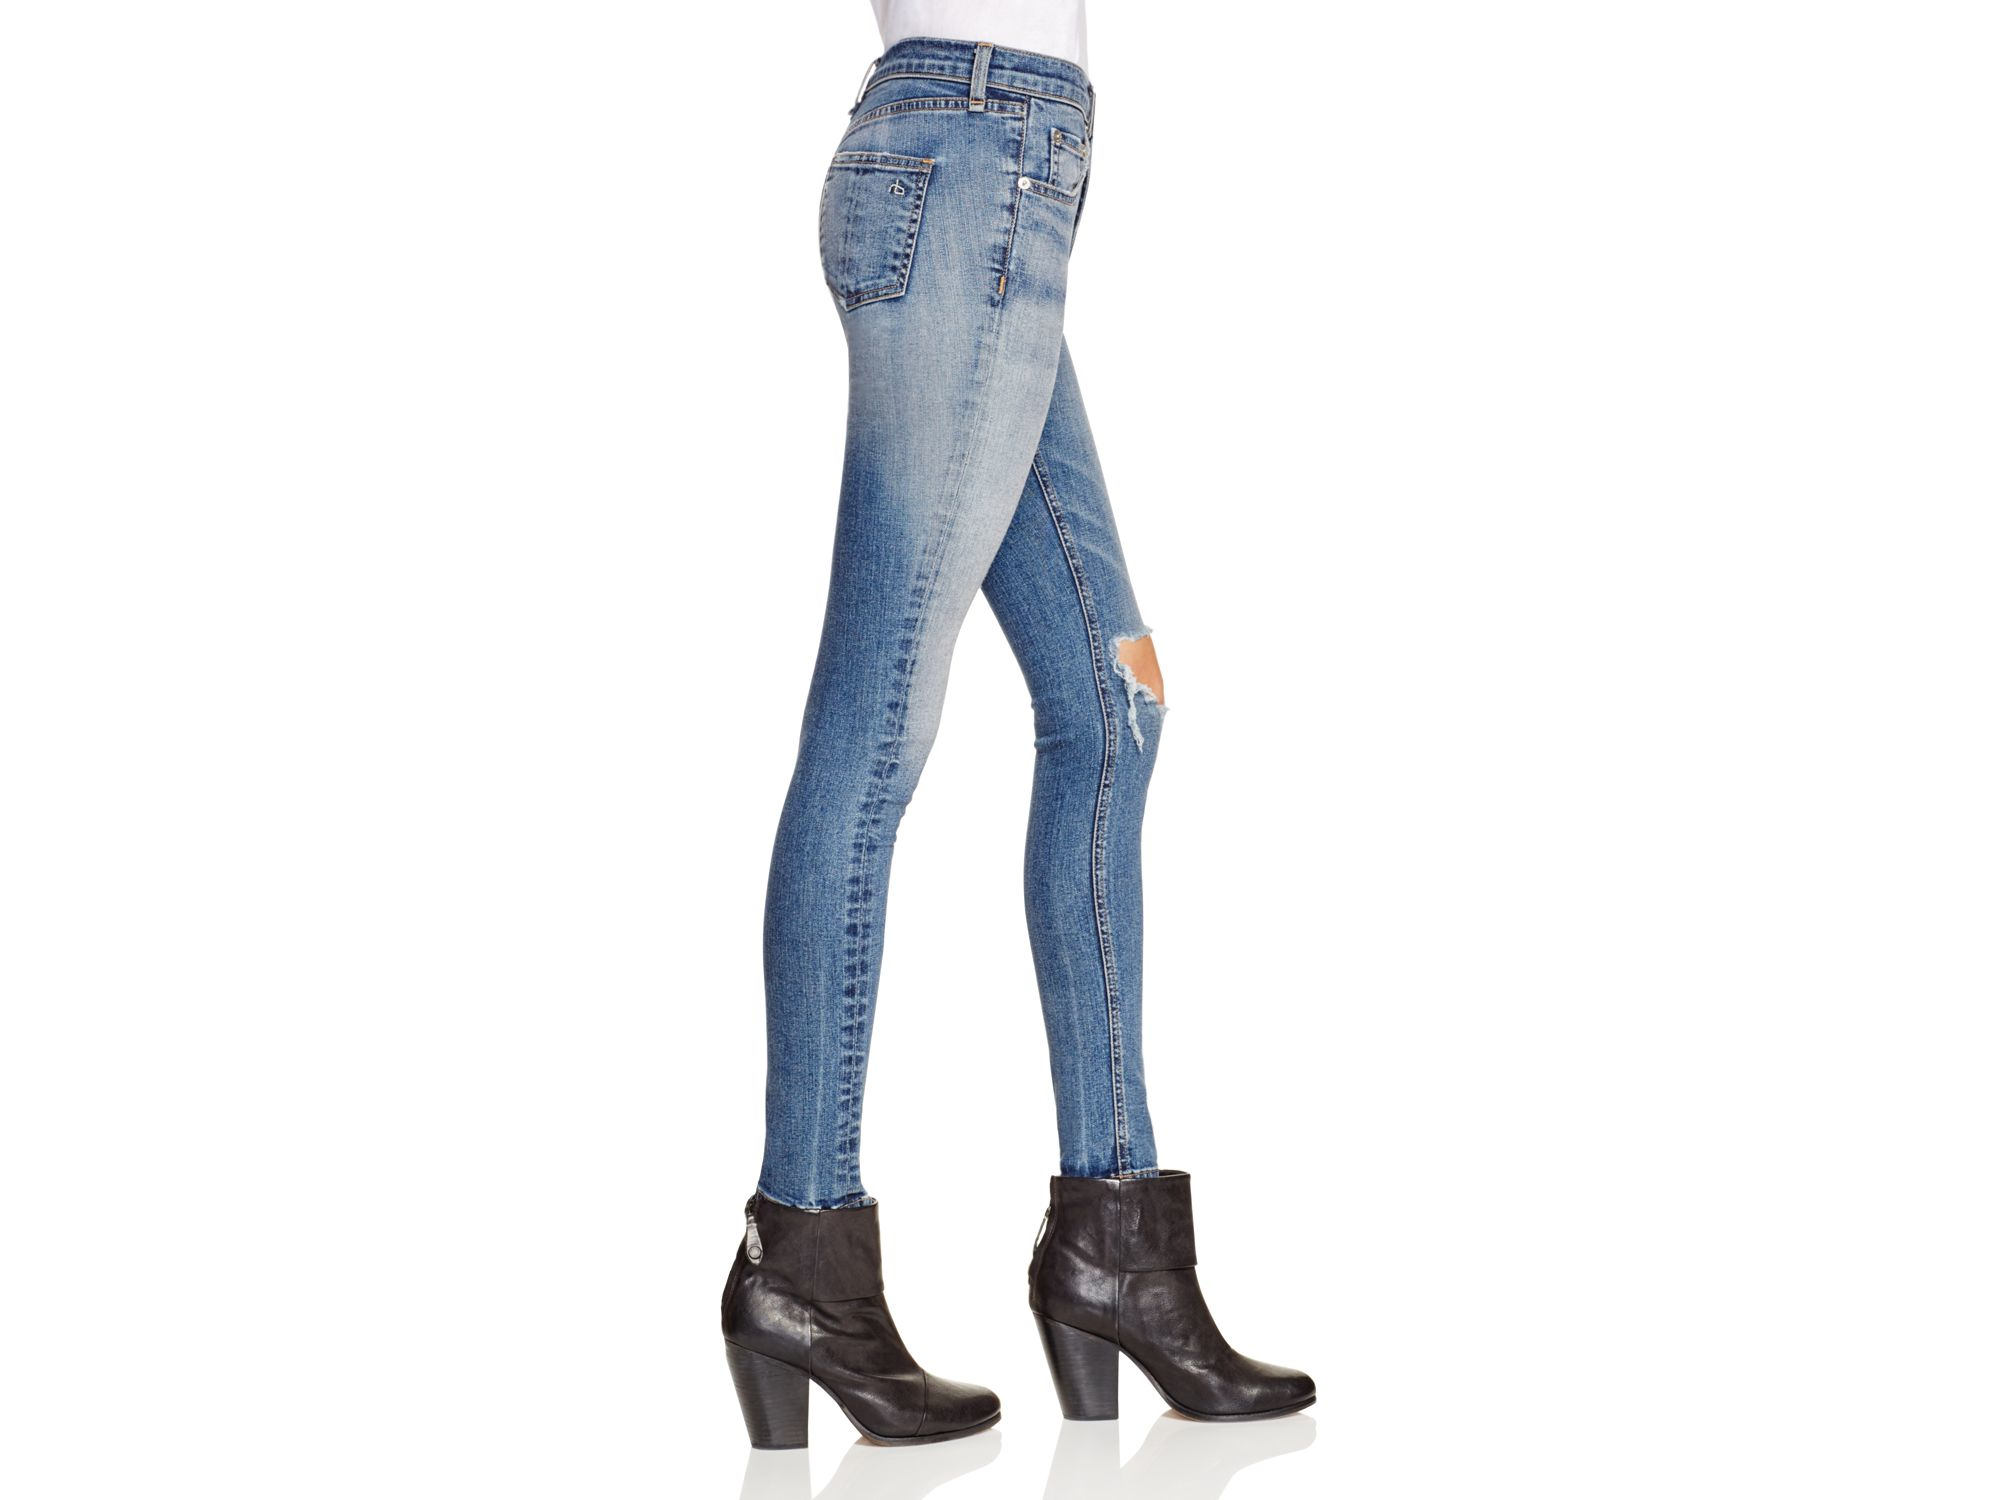 007f3b493805 Lyst - Rag   Bone High Rise Skinny Jeans In Ward in Blue